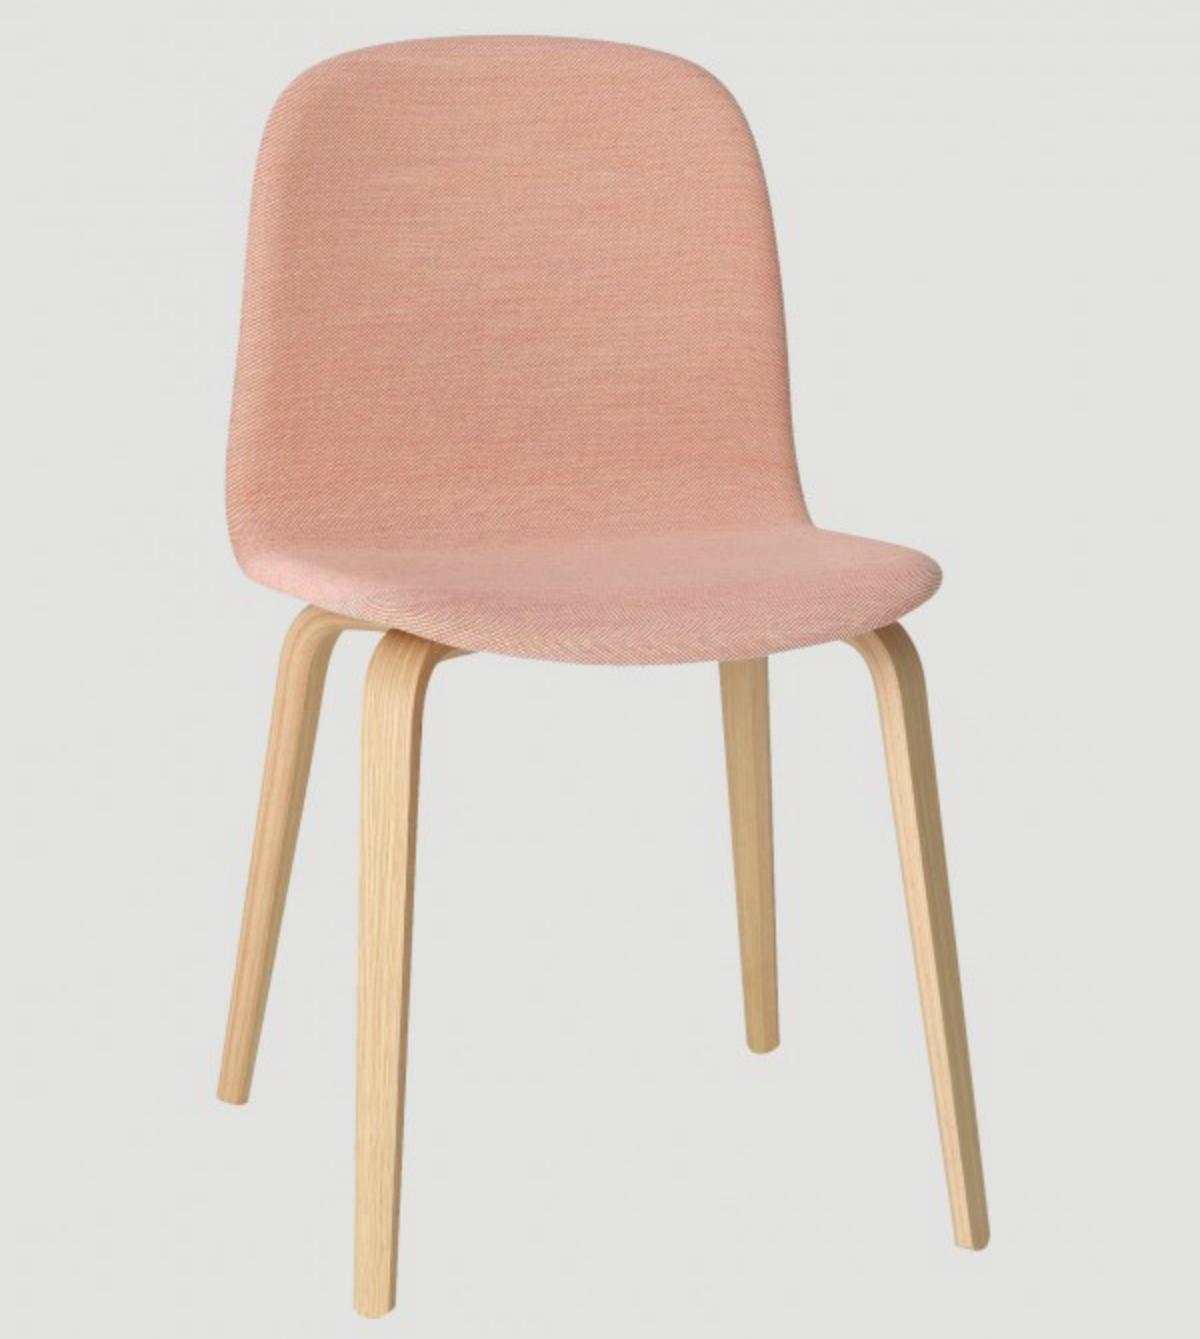 Muuto a New Perspective on Scandinavian Design